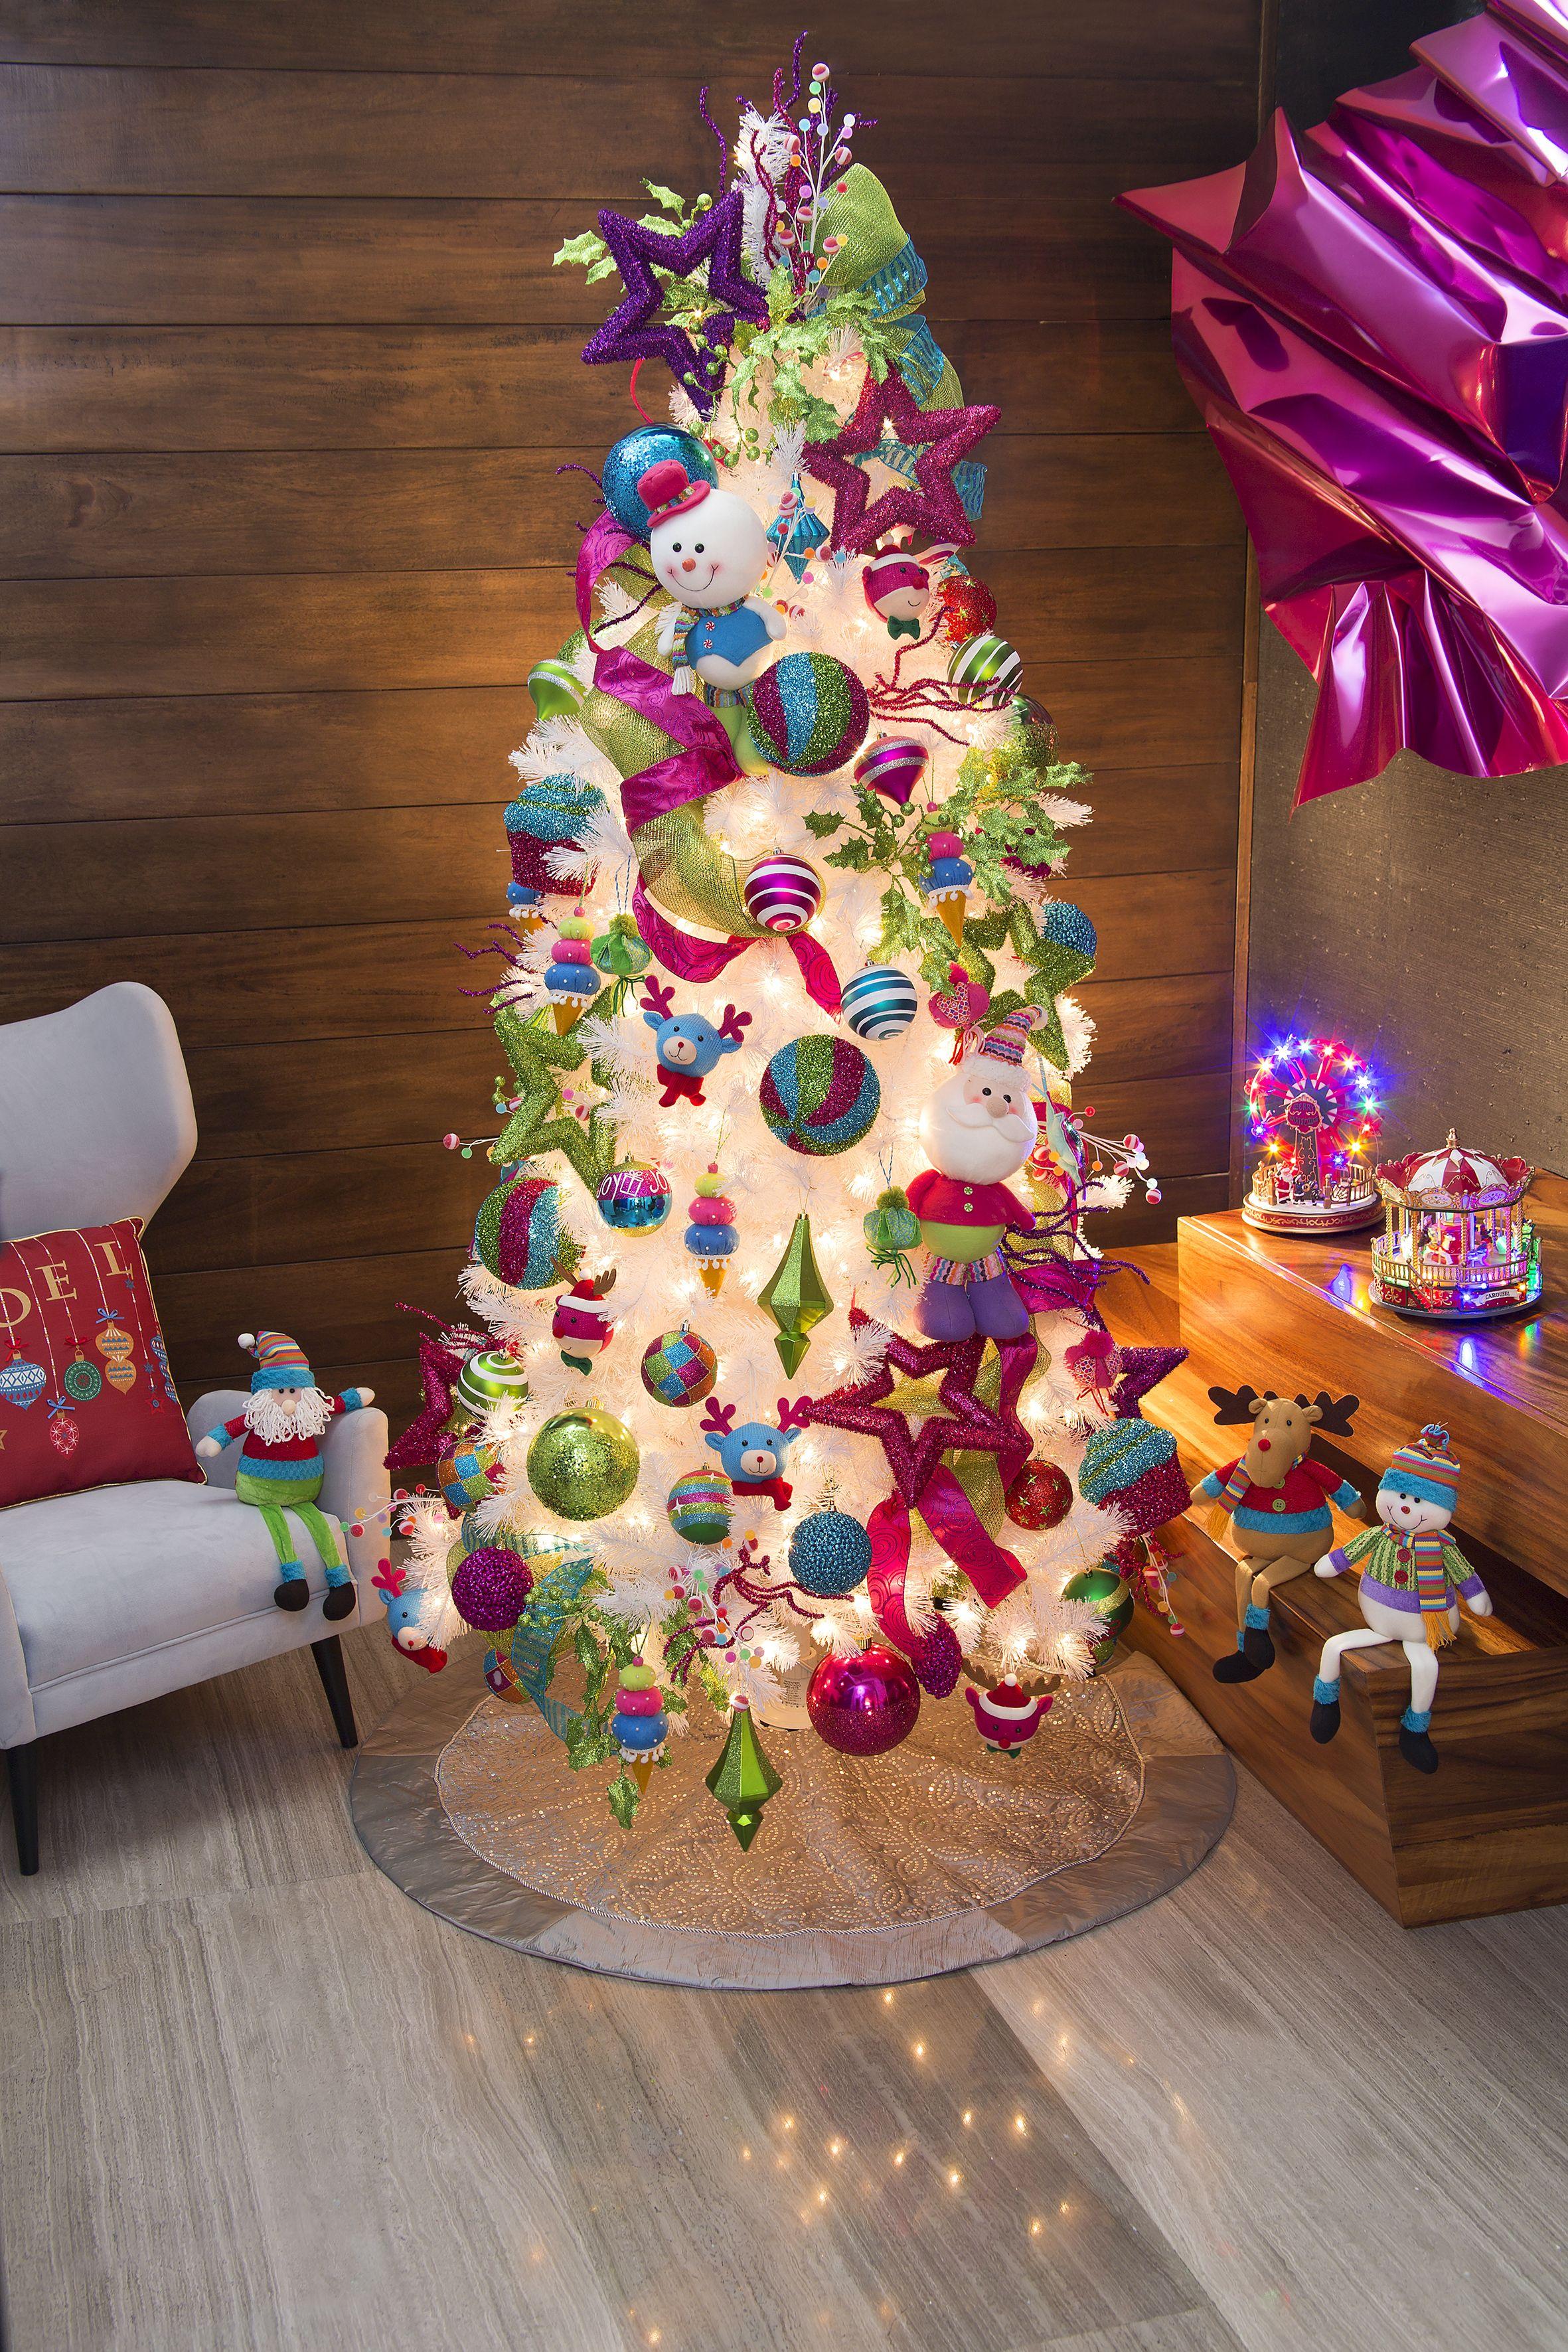 Decoraci n para pino navide o familia glim decoracion - Decoracion arboles navidenos ...